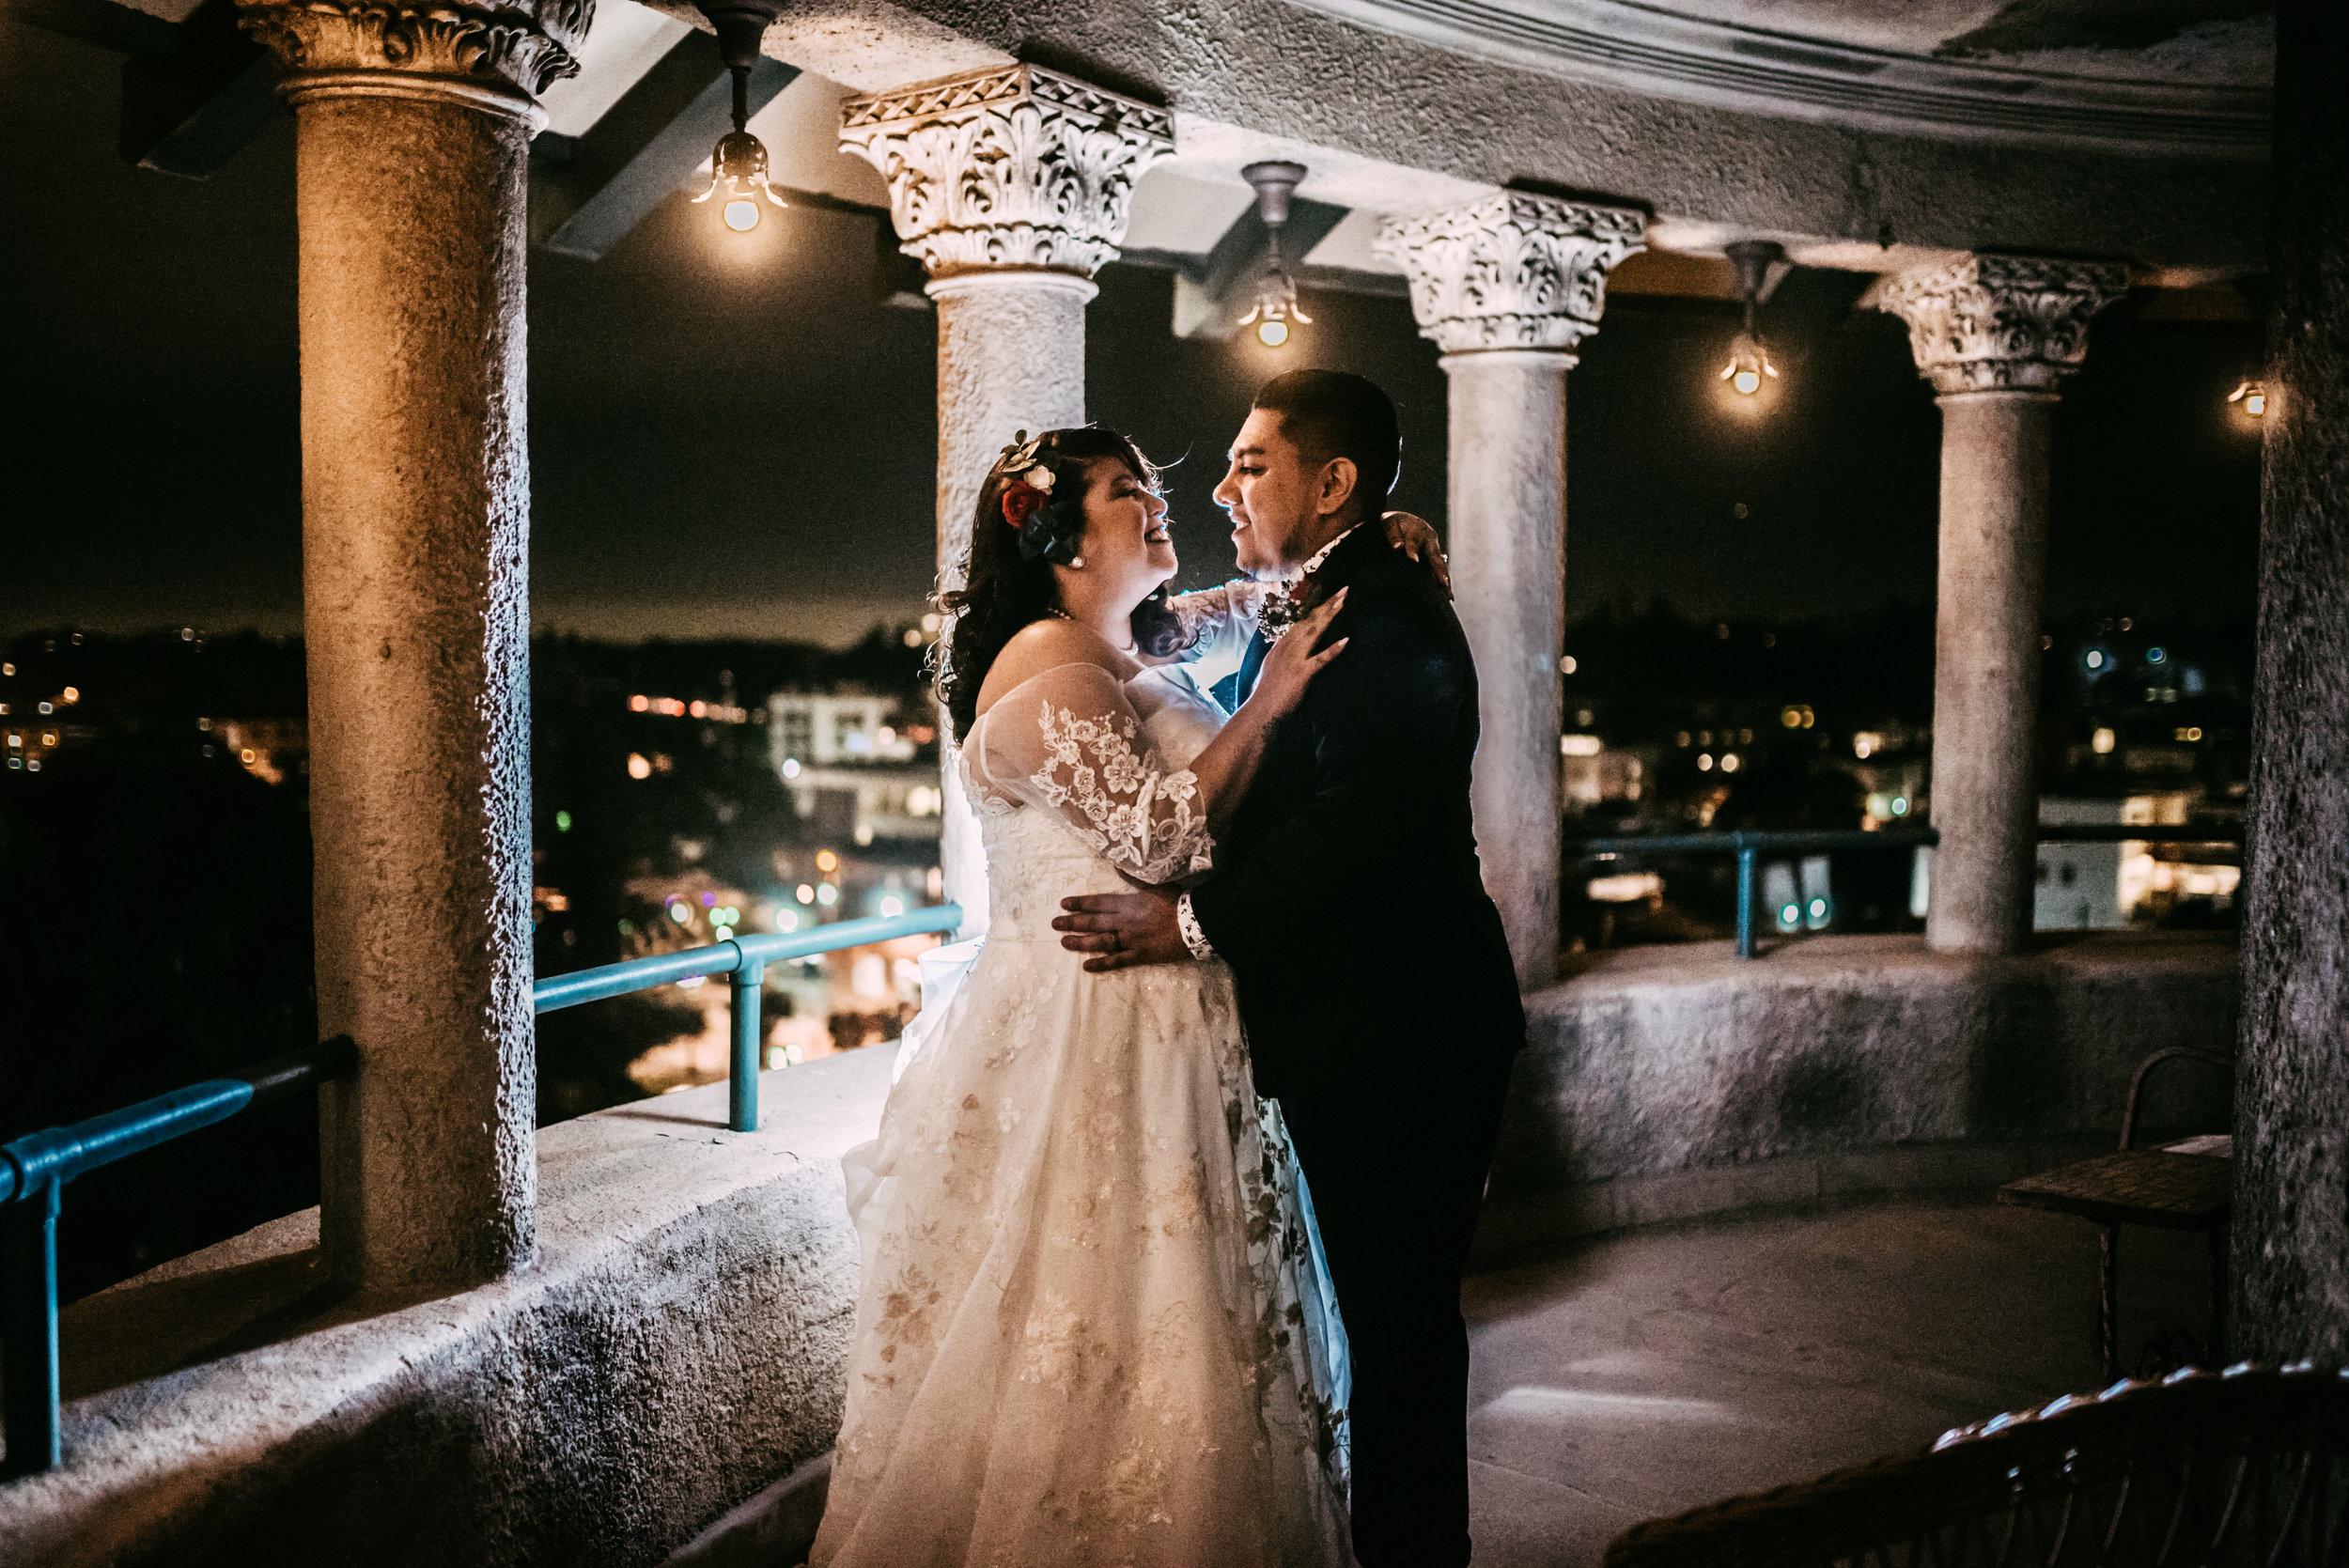 natalie-wedding-green-castle-pasadena-disney-theme-2-40.jpg